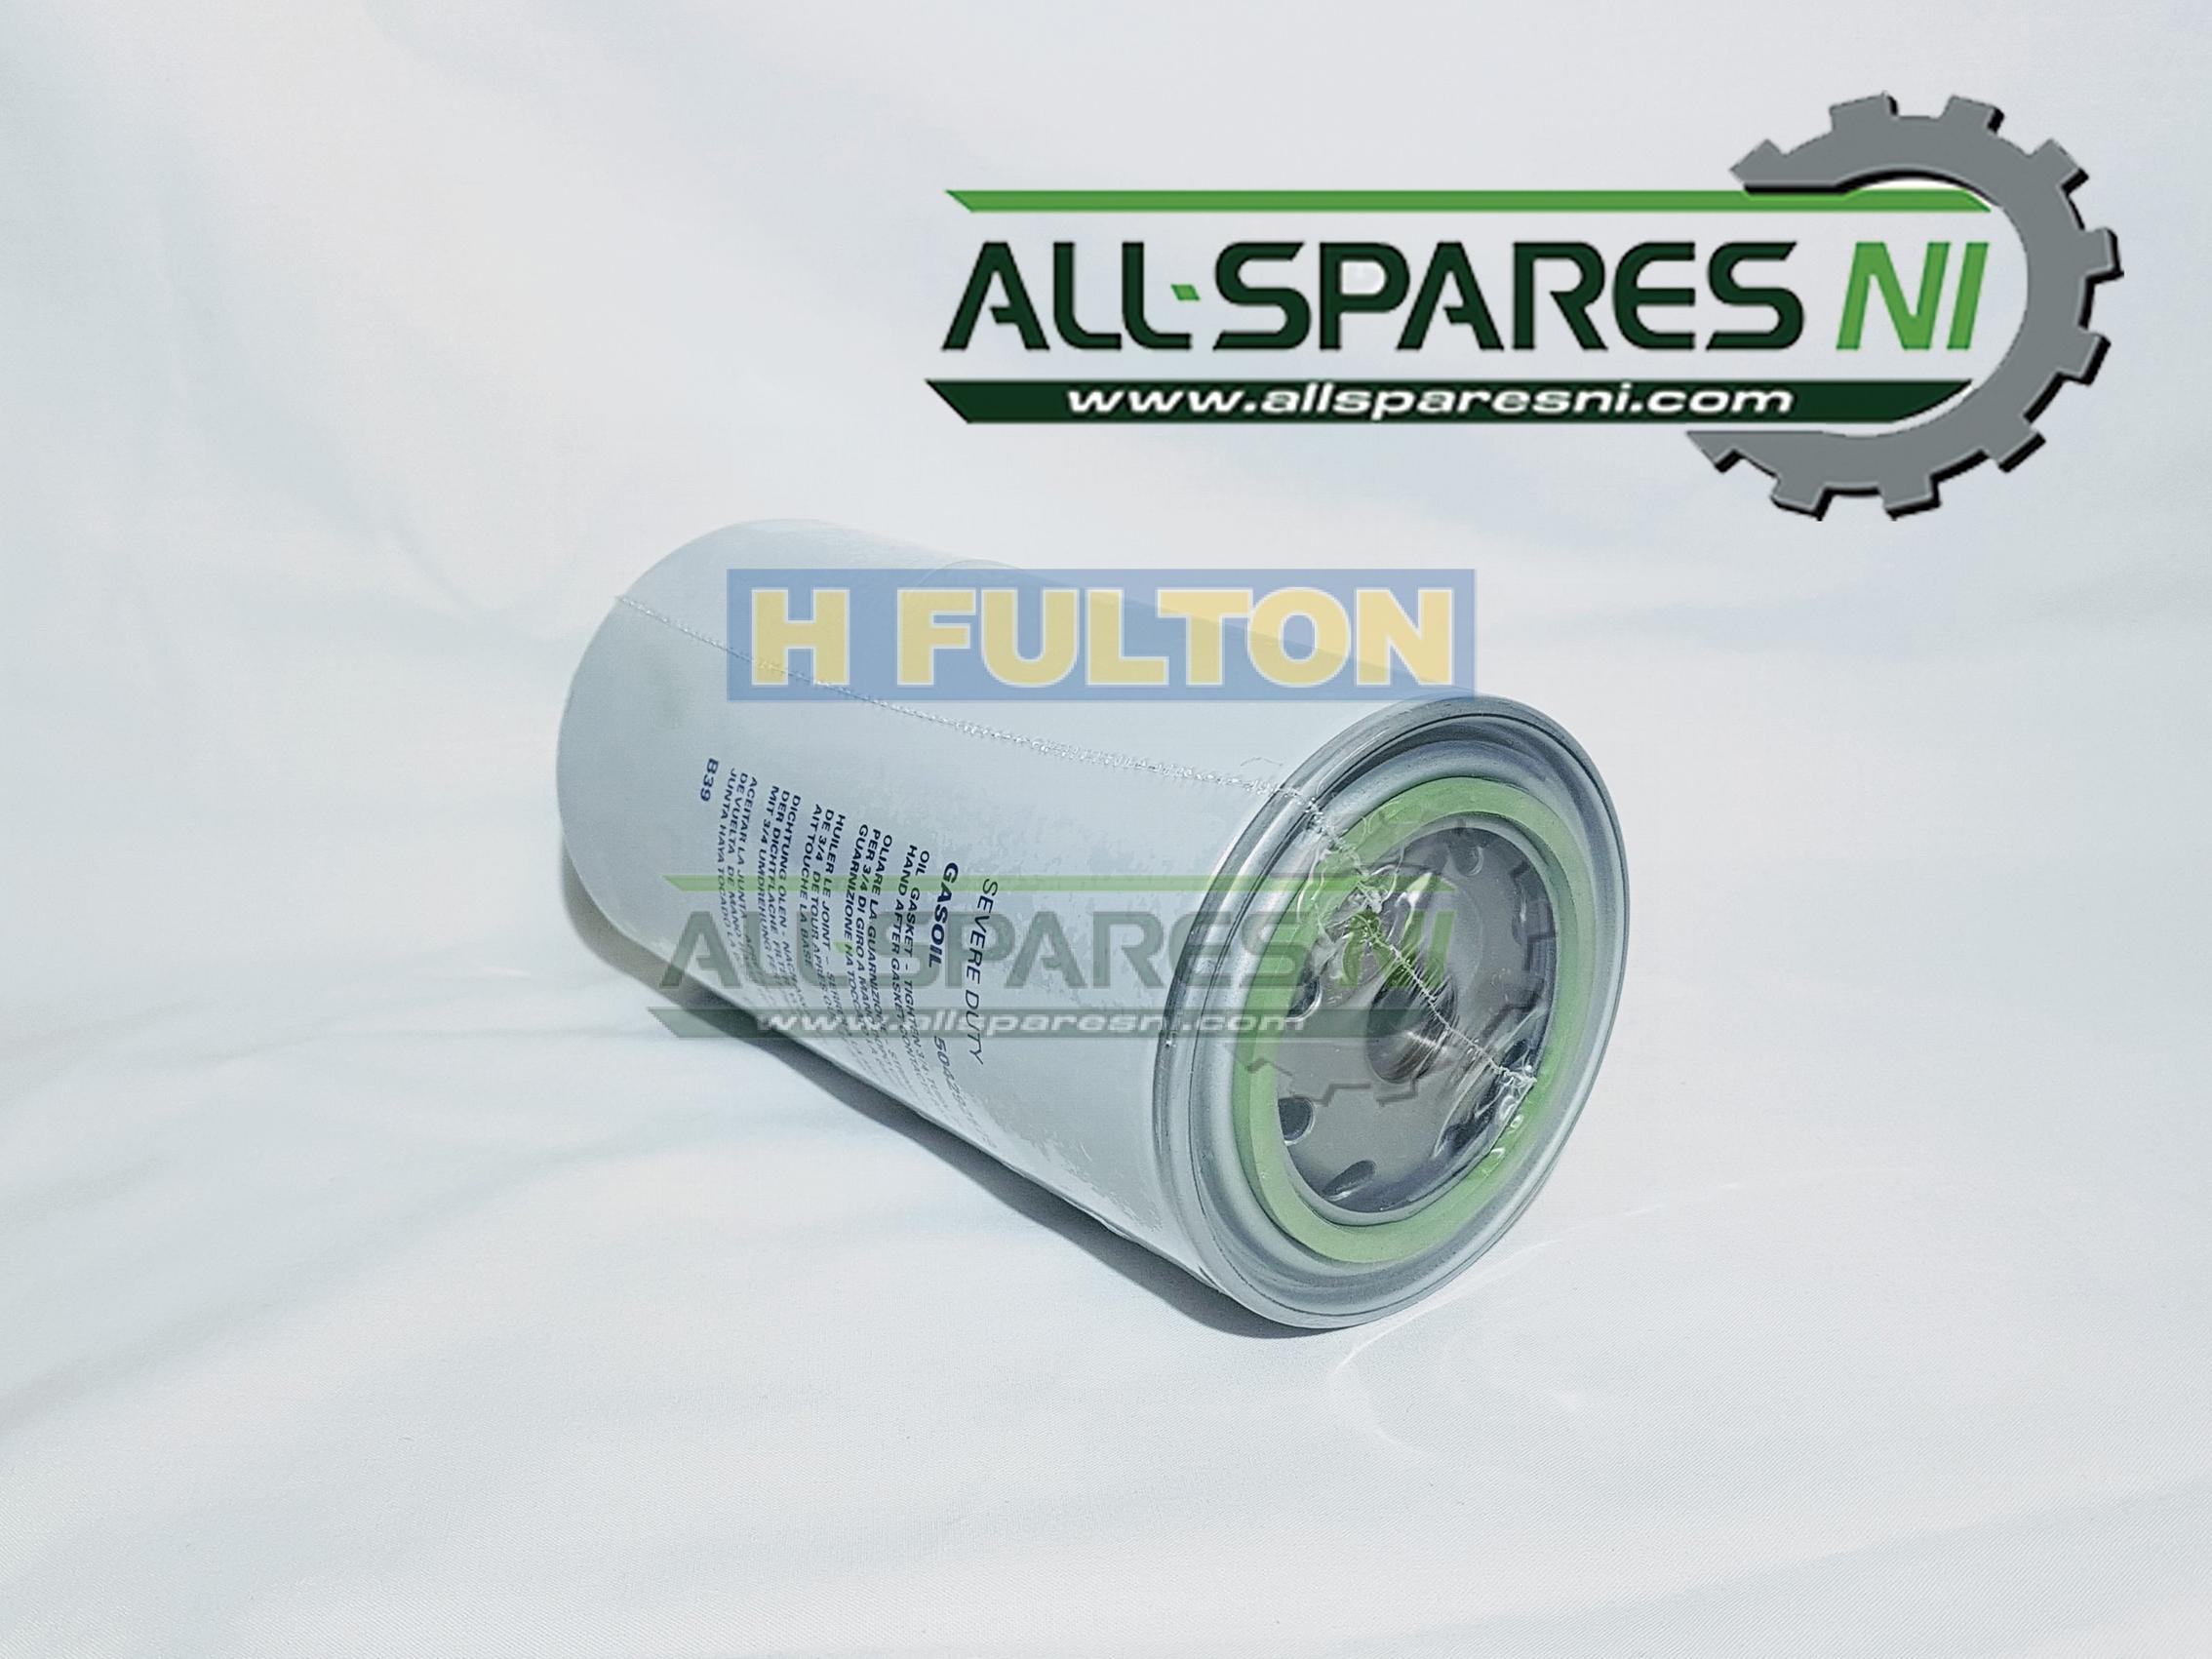 Genuine Mccormick Fuel Filter All Spares Ni Perkins Filters 1750